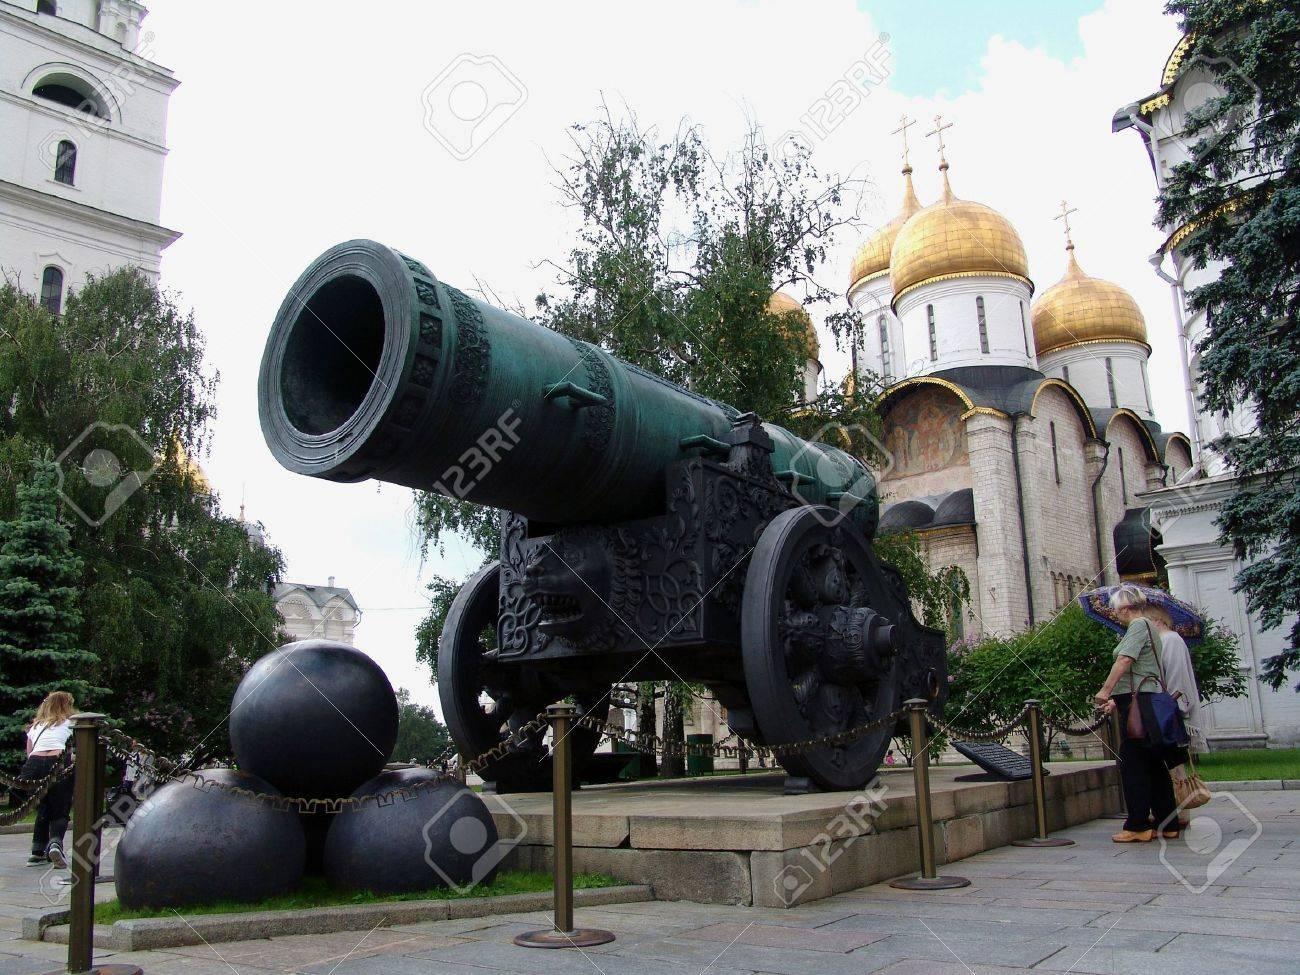 Tsar-gun, kernels, Kremlin, Moscow, Russia - 2083275